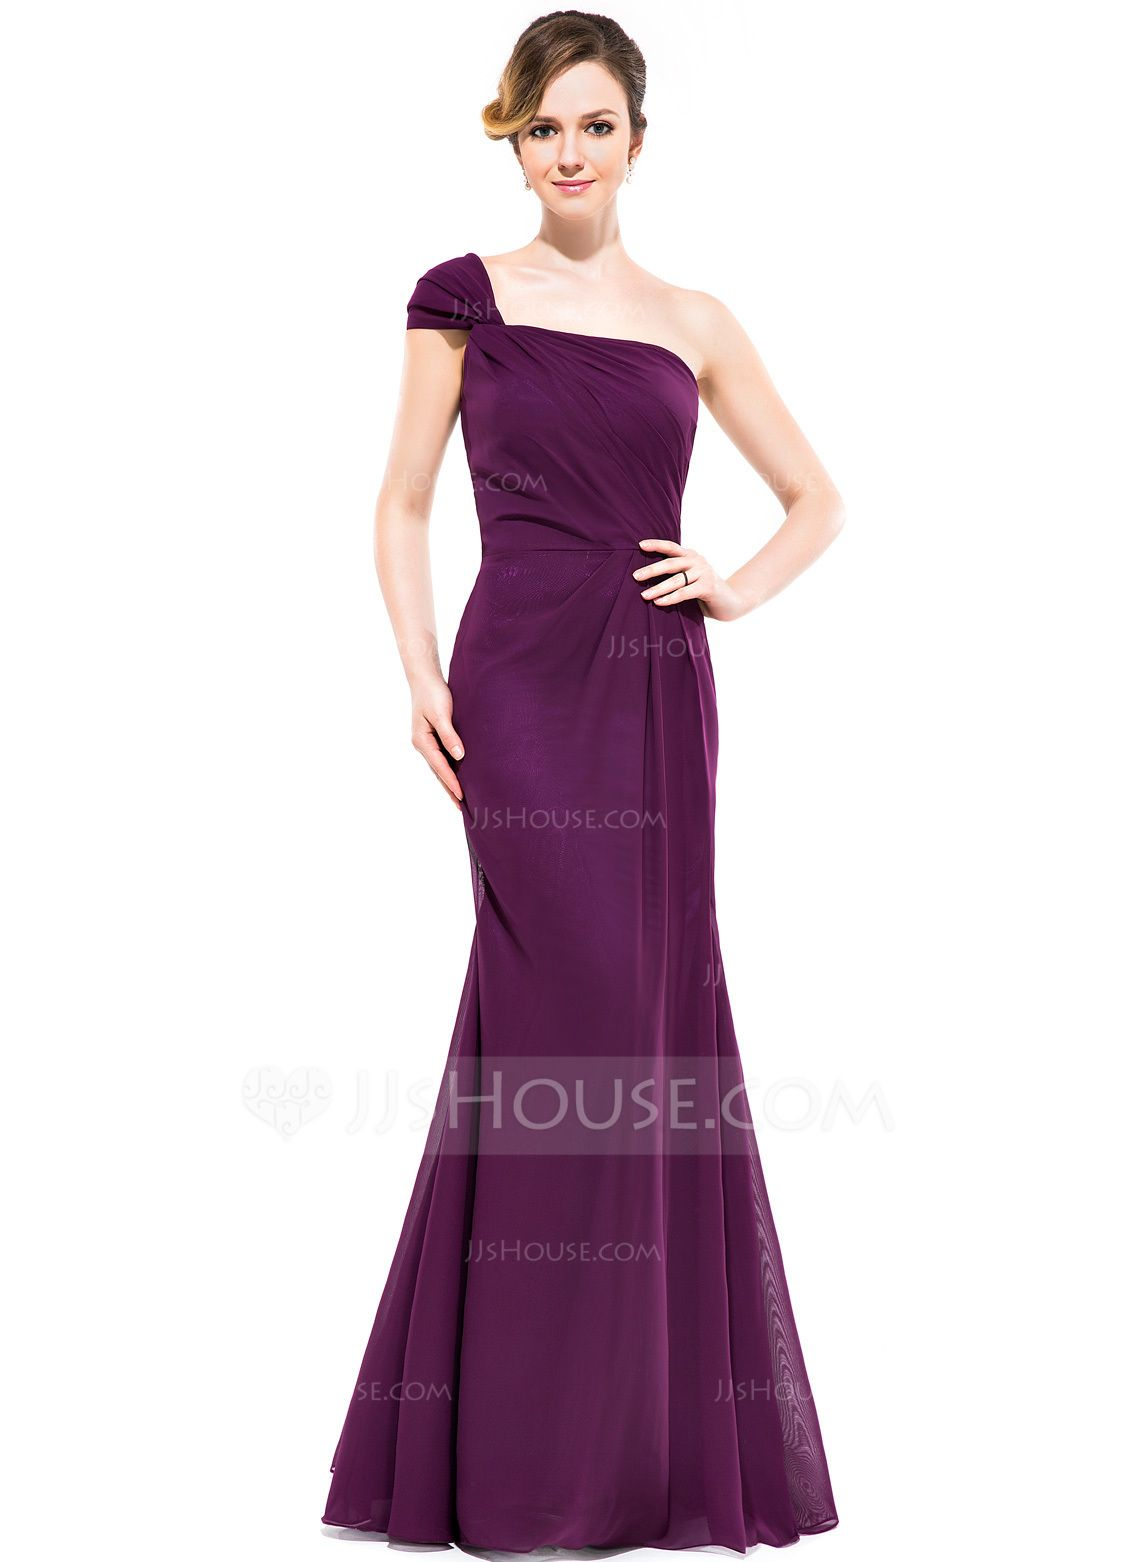 Trumpetmermaid oneshoulder floorlength chiffon bridesmaid dress